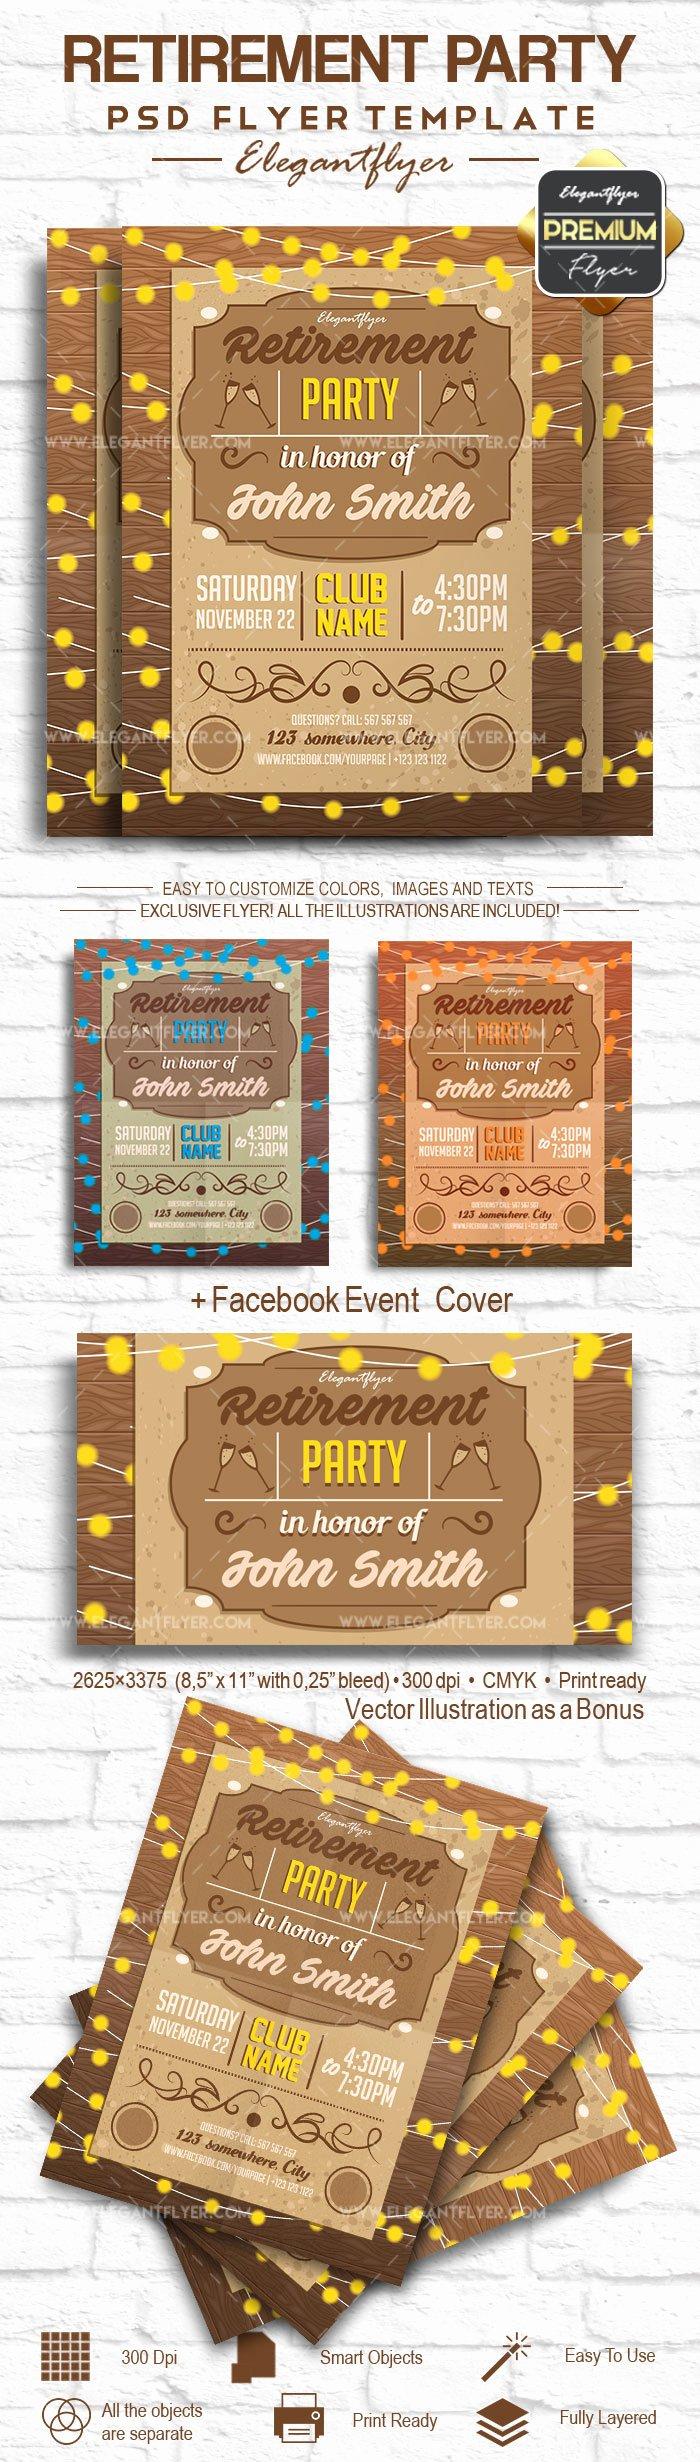 Retirement Party – Flyer Psd Template – by Elegantflyer